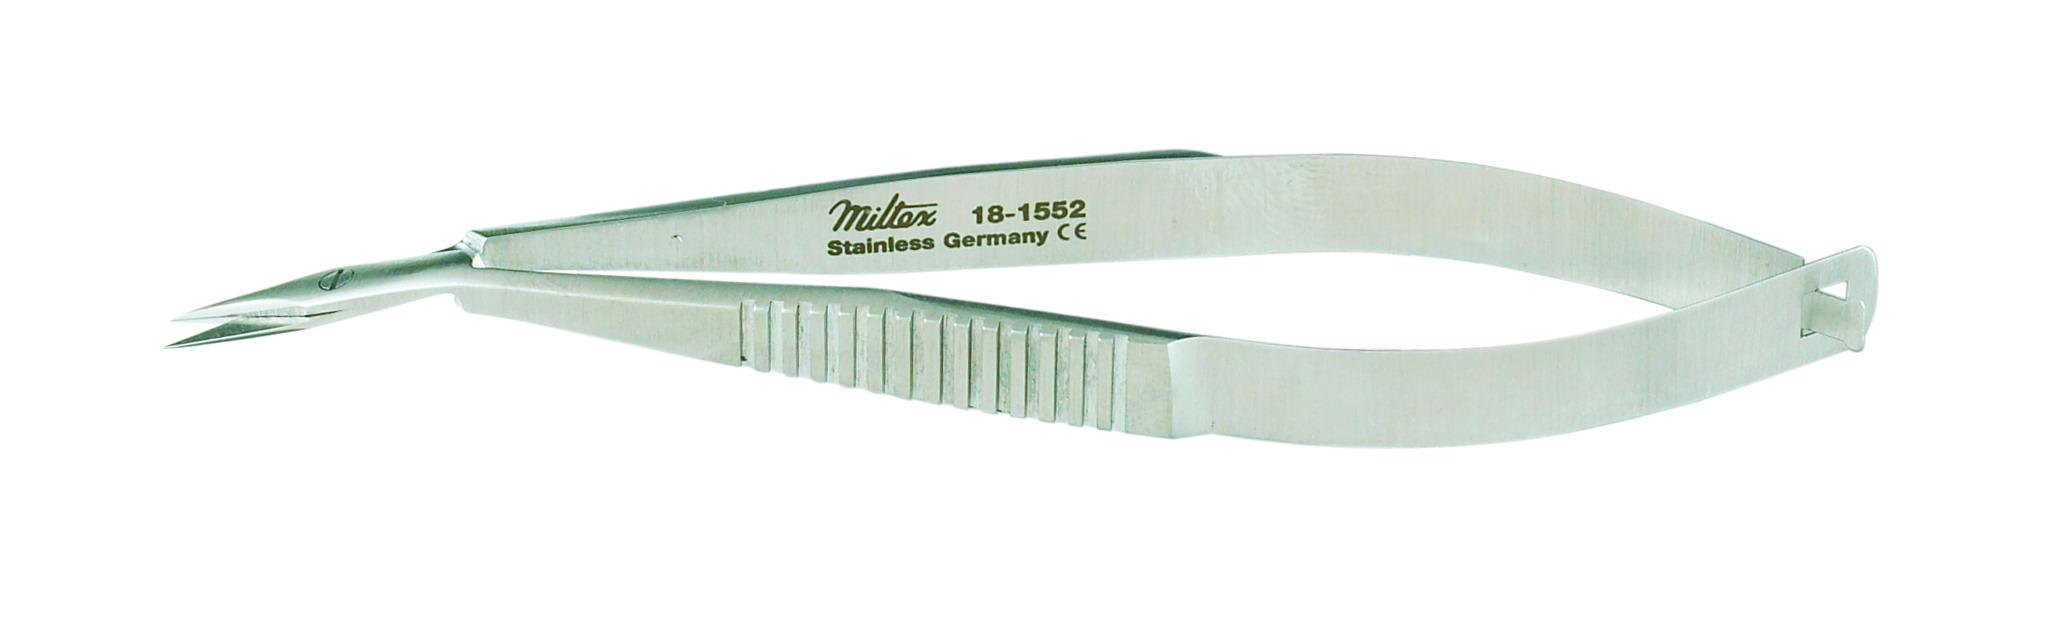 mcclure-scs-ang-flat-4mm-18-1552-miltex.jpg